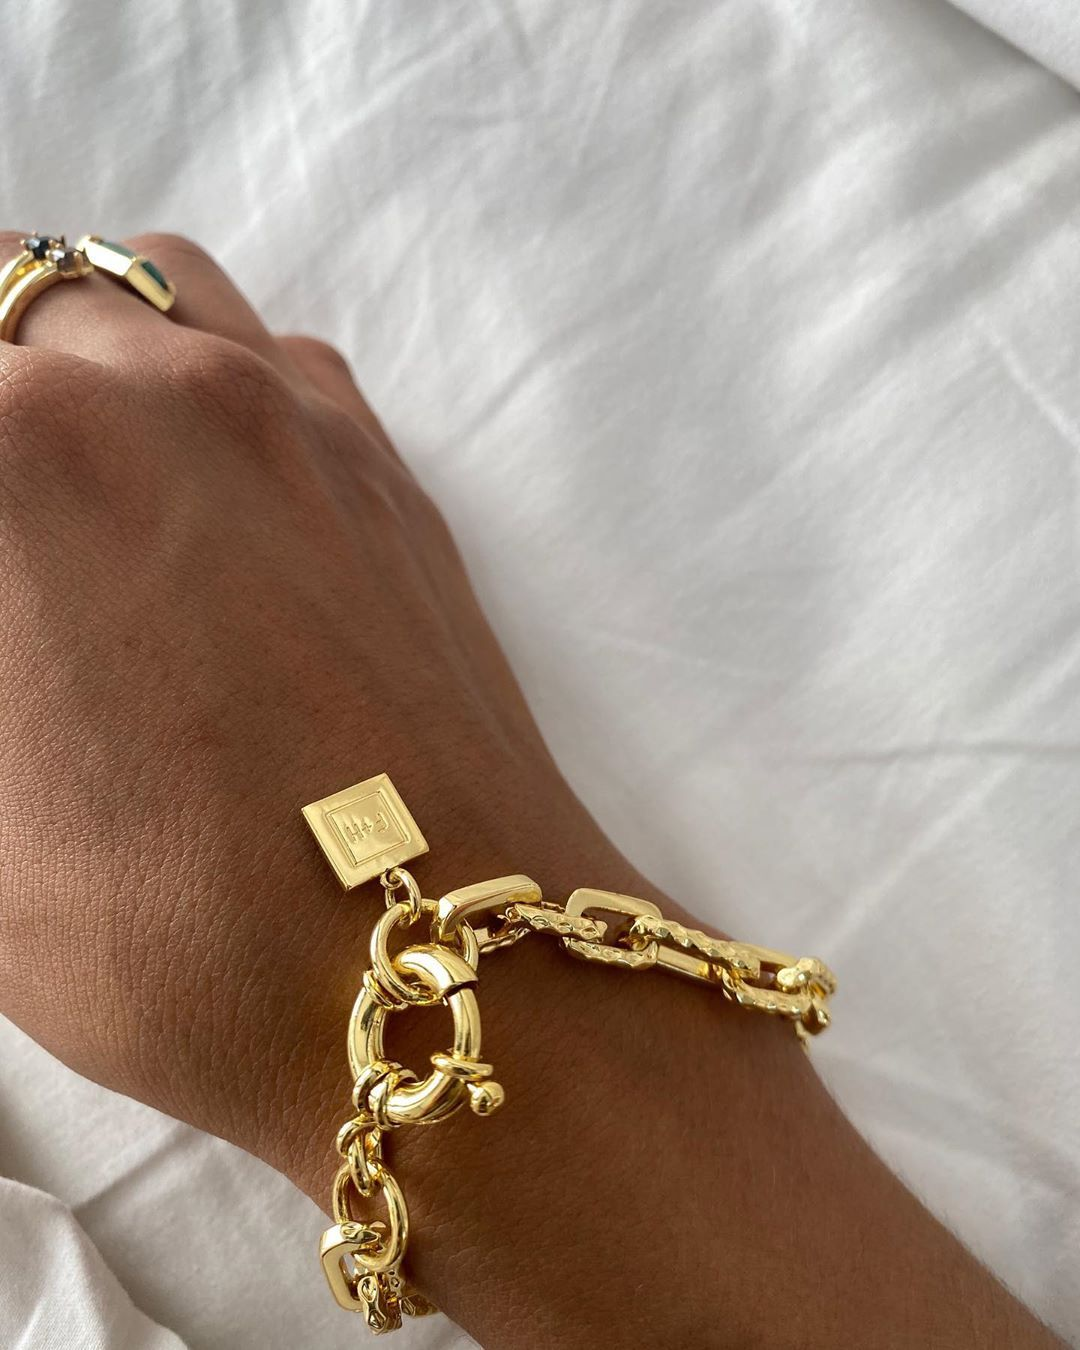 Richy-Glory Bridal jewelry sets,gold plated jewelry set